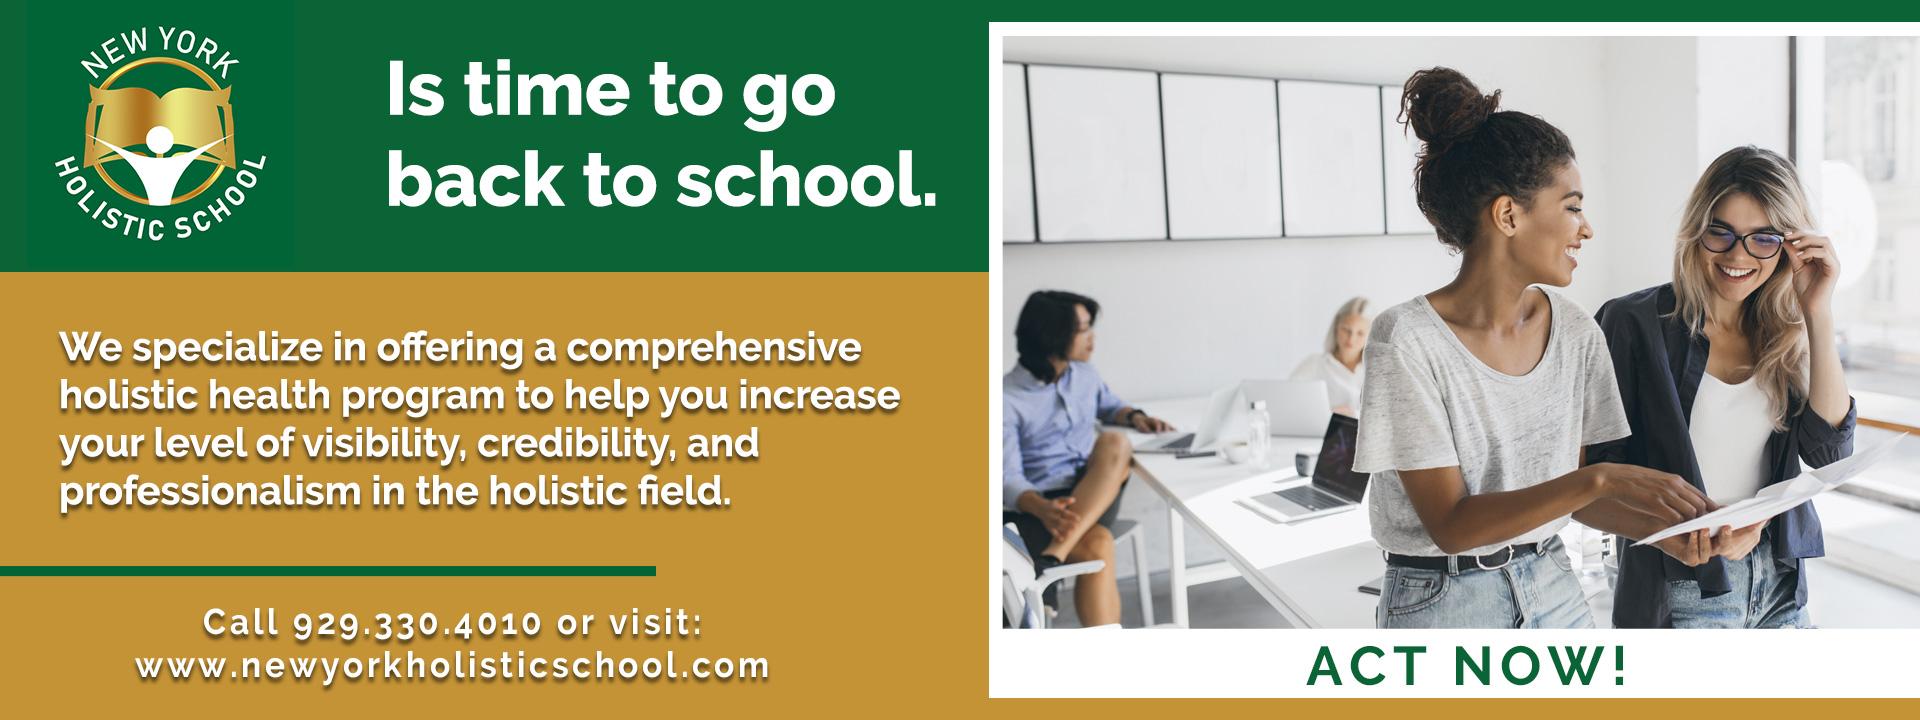 slider-go-back-to-school